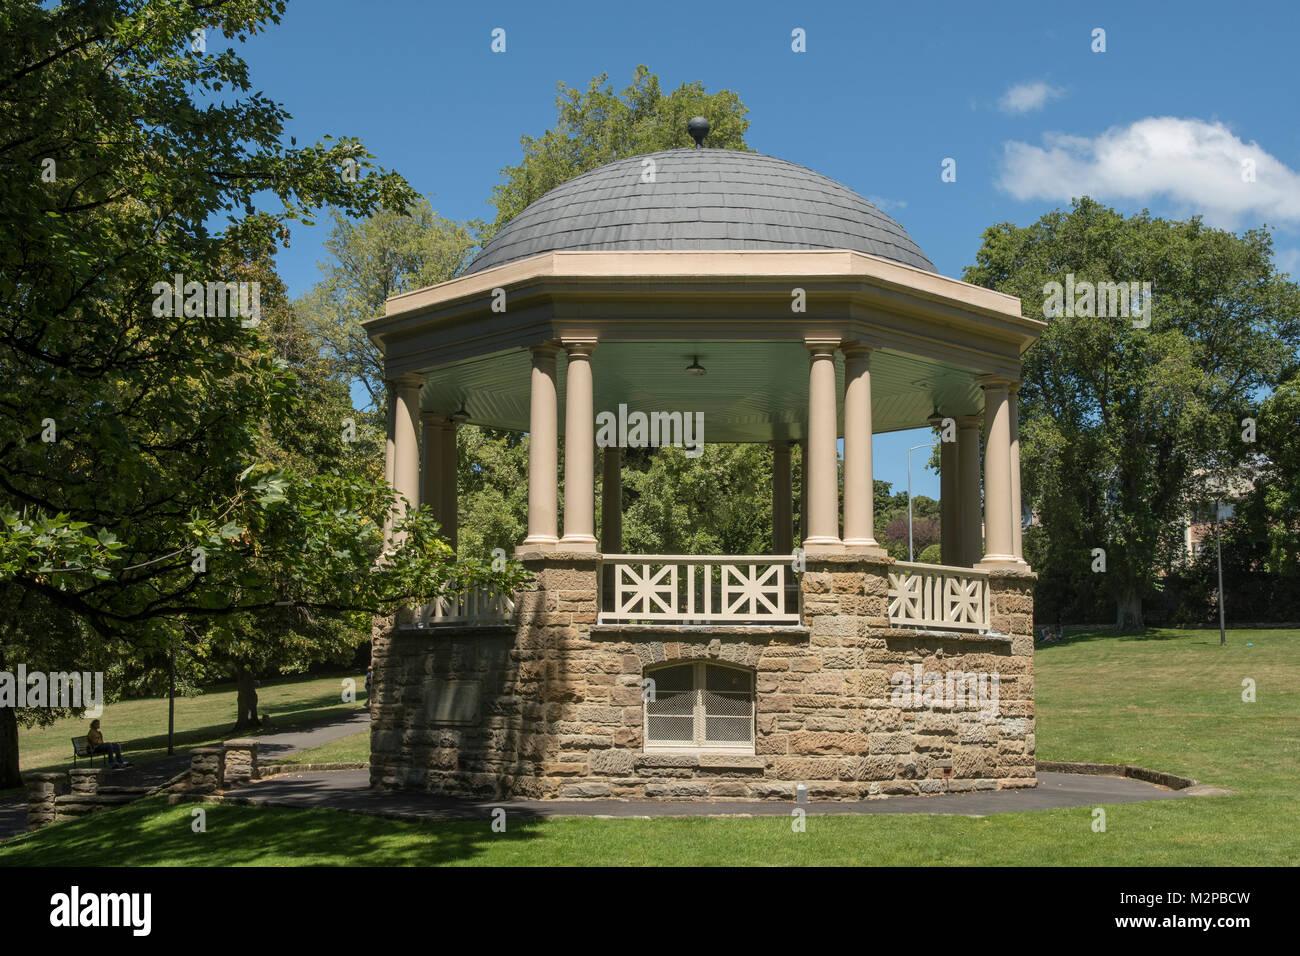 Bandstand in St David's Park, Hobart, Tasmania, Australia - Stock Image